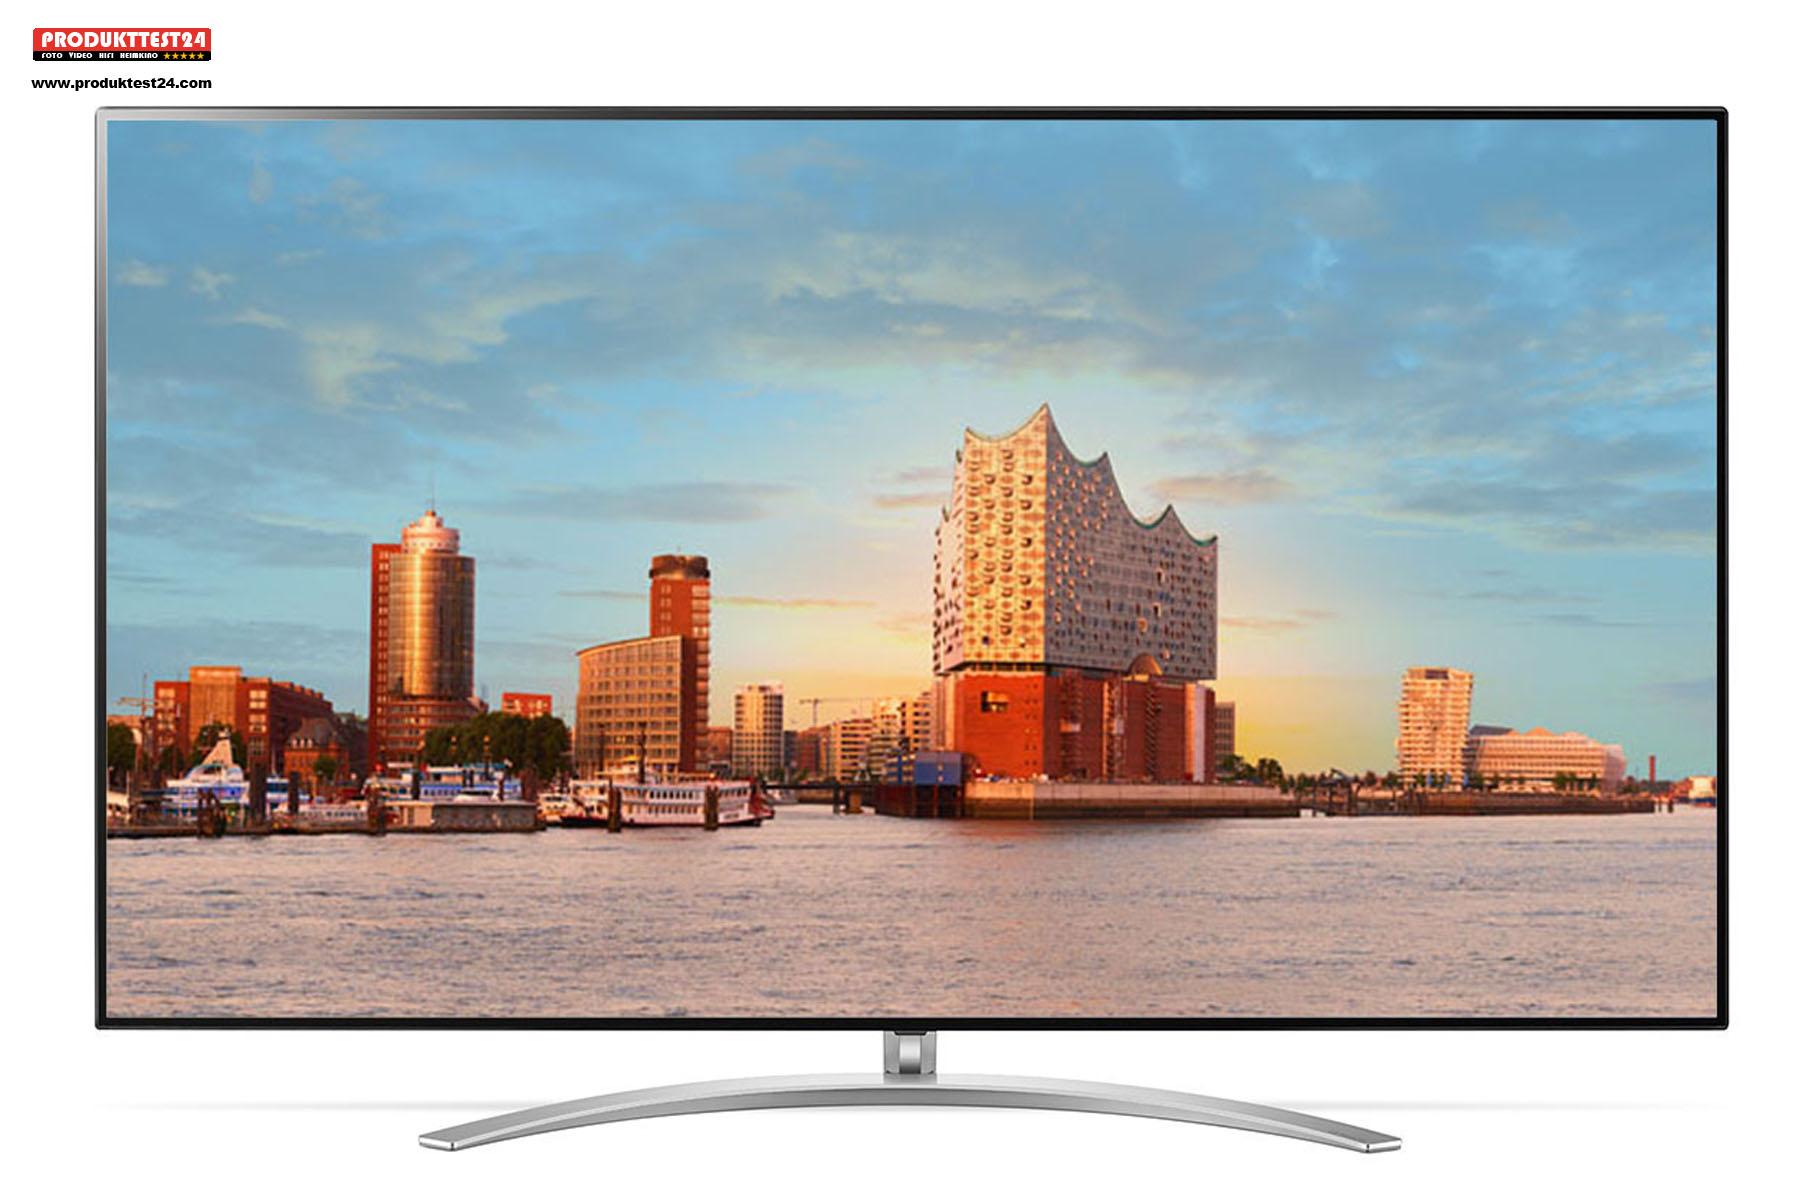 LG 55SM9010PLA NanoCell 4K-Fernseher im Test